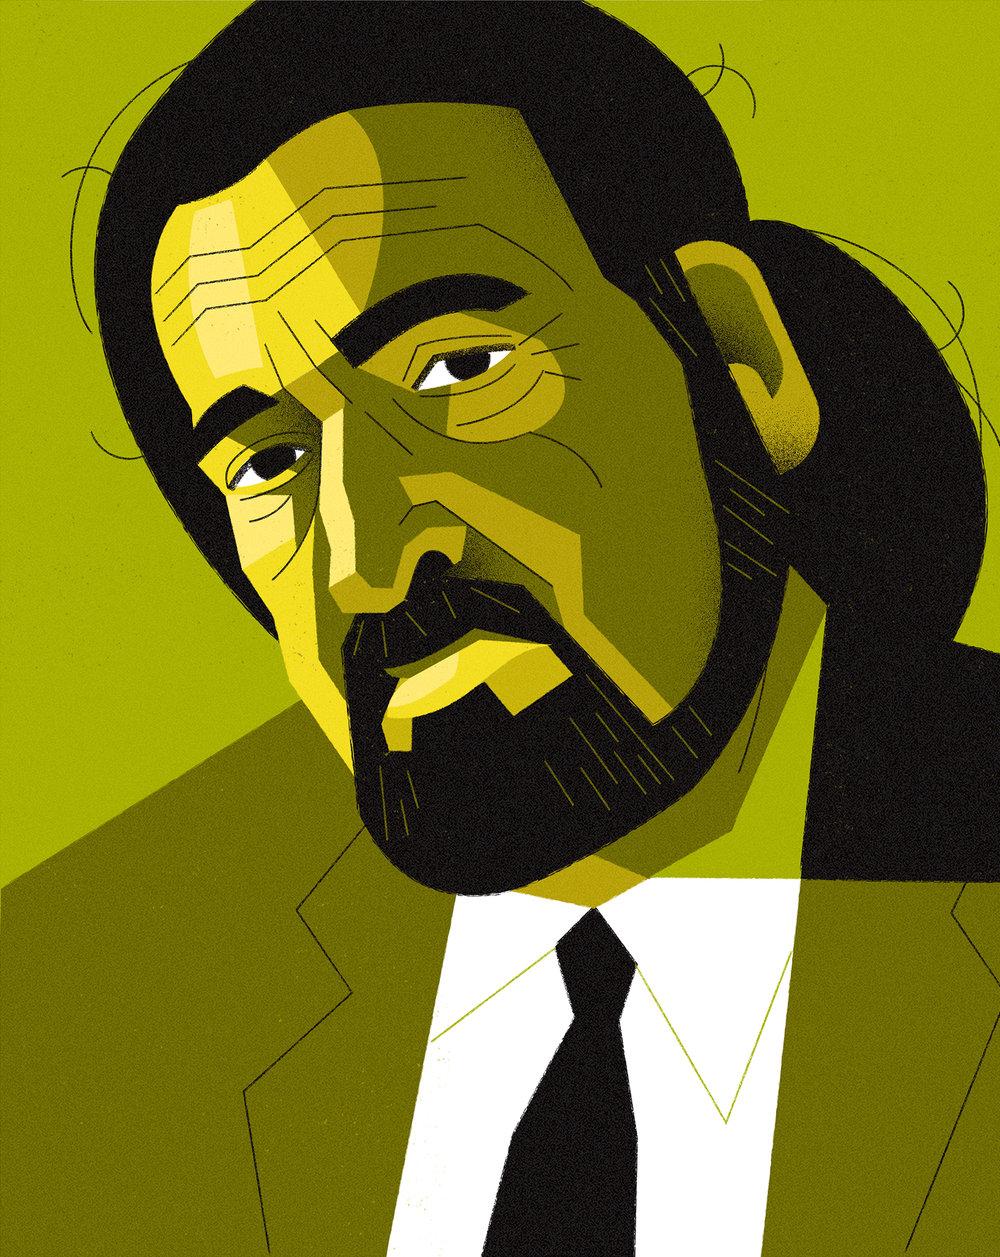 dale edwin murray freelance illustrator tryke weed illustration